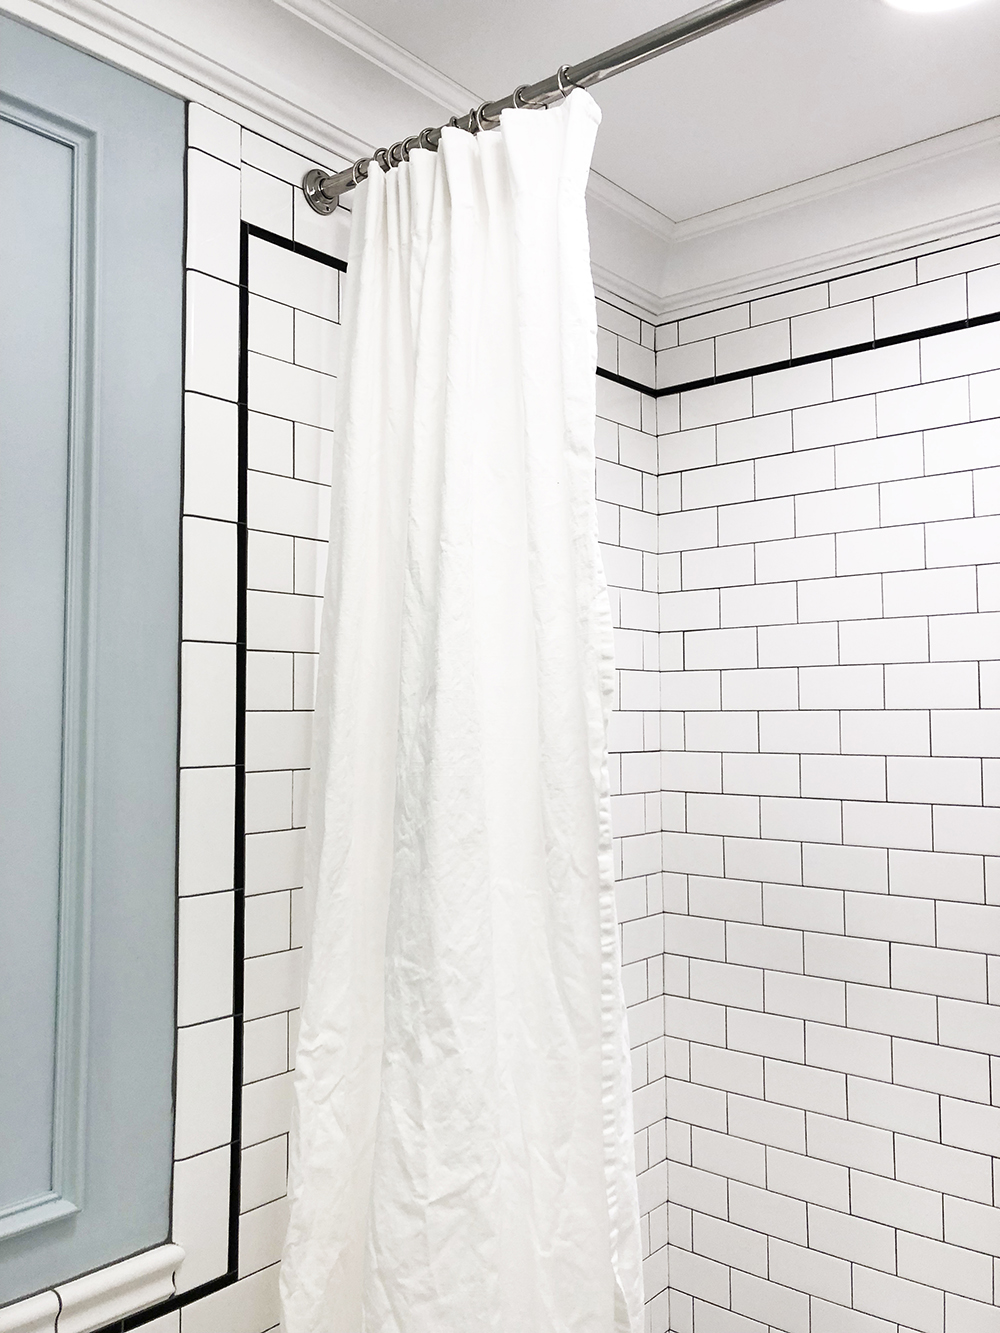 للتعديل اتجاه ثلاثي long shower curtain